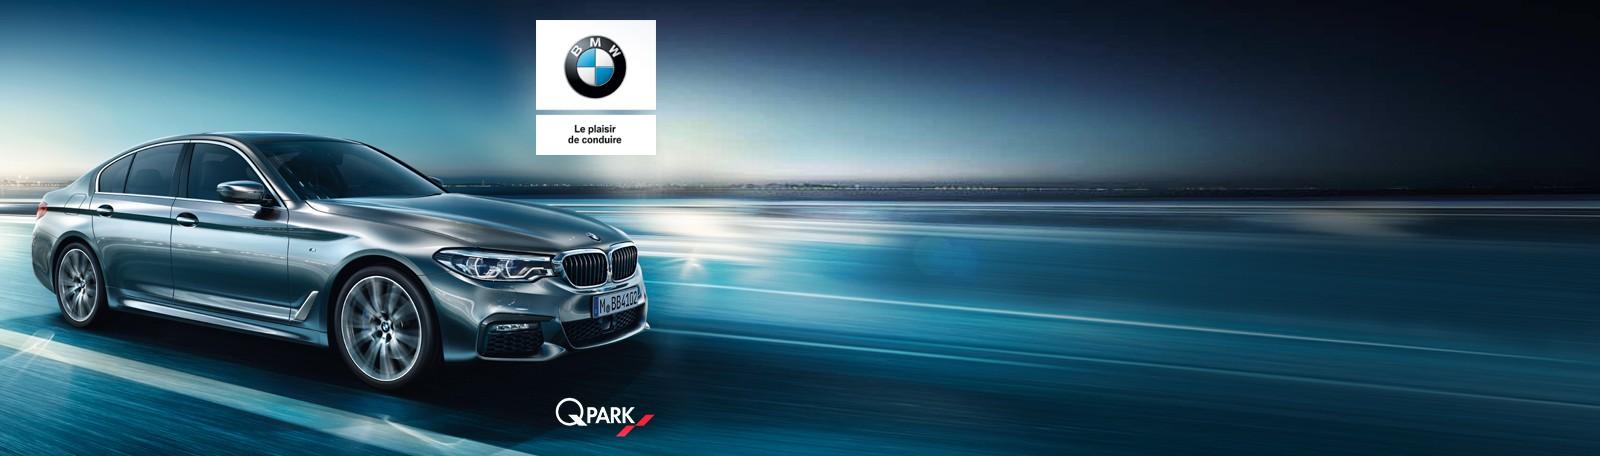 Partnership BMW 2017